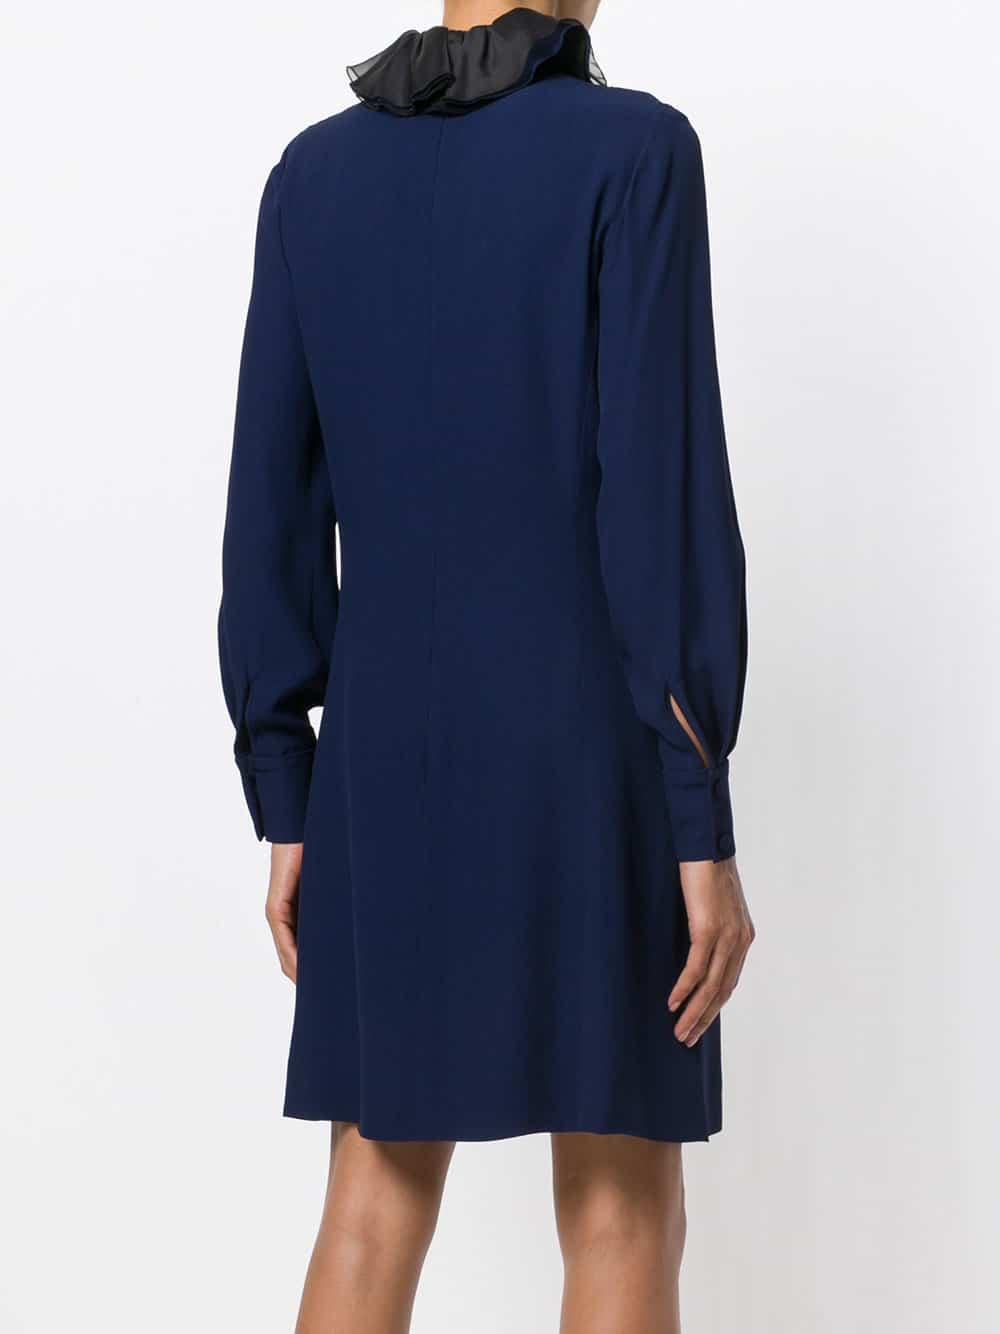 LANVIN Ruffled Blue Dress